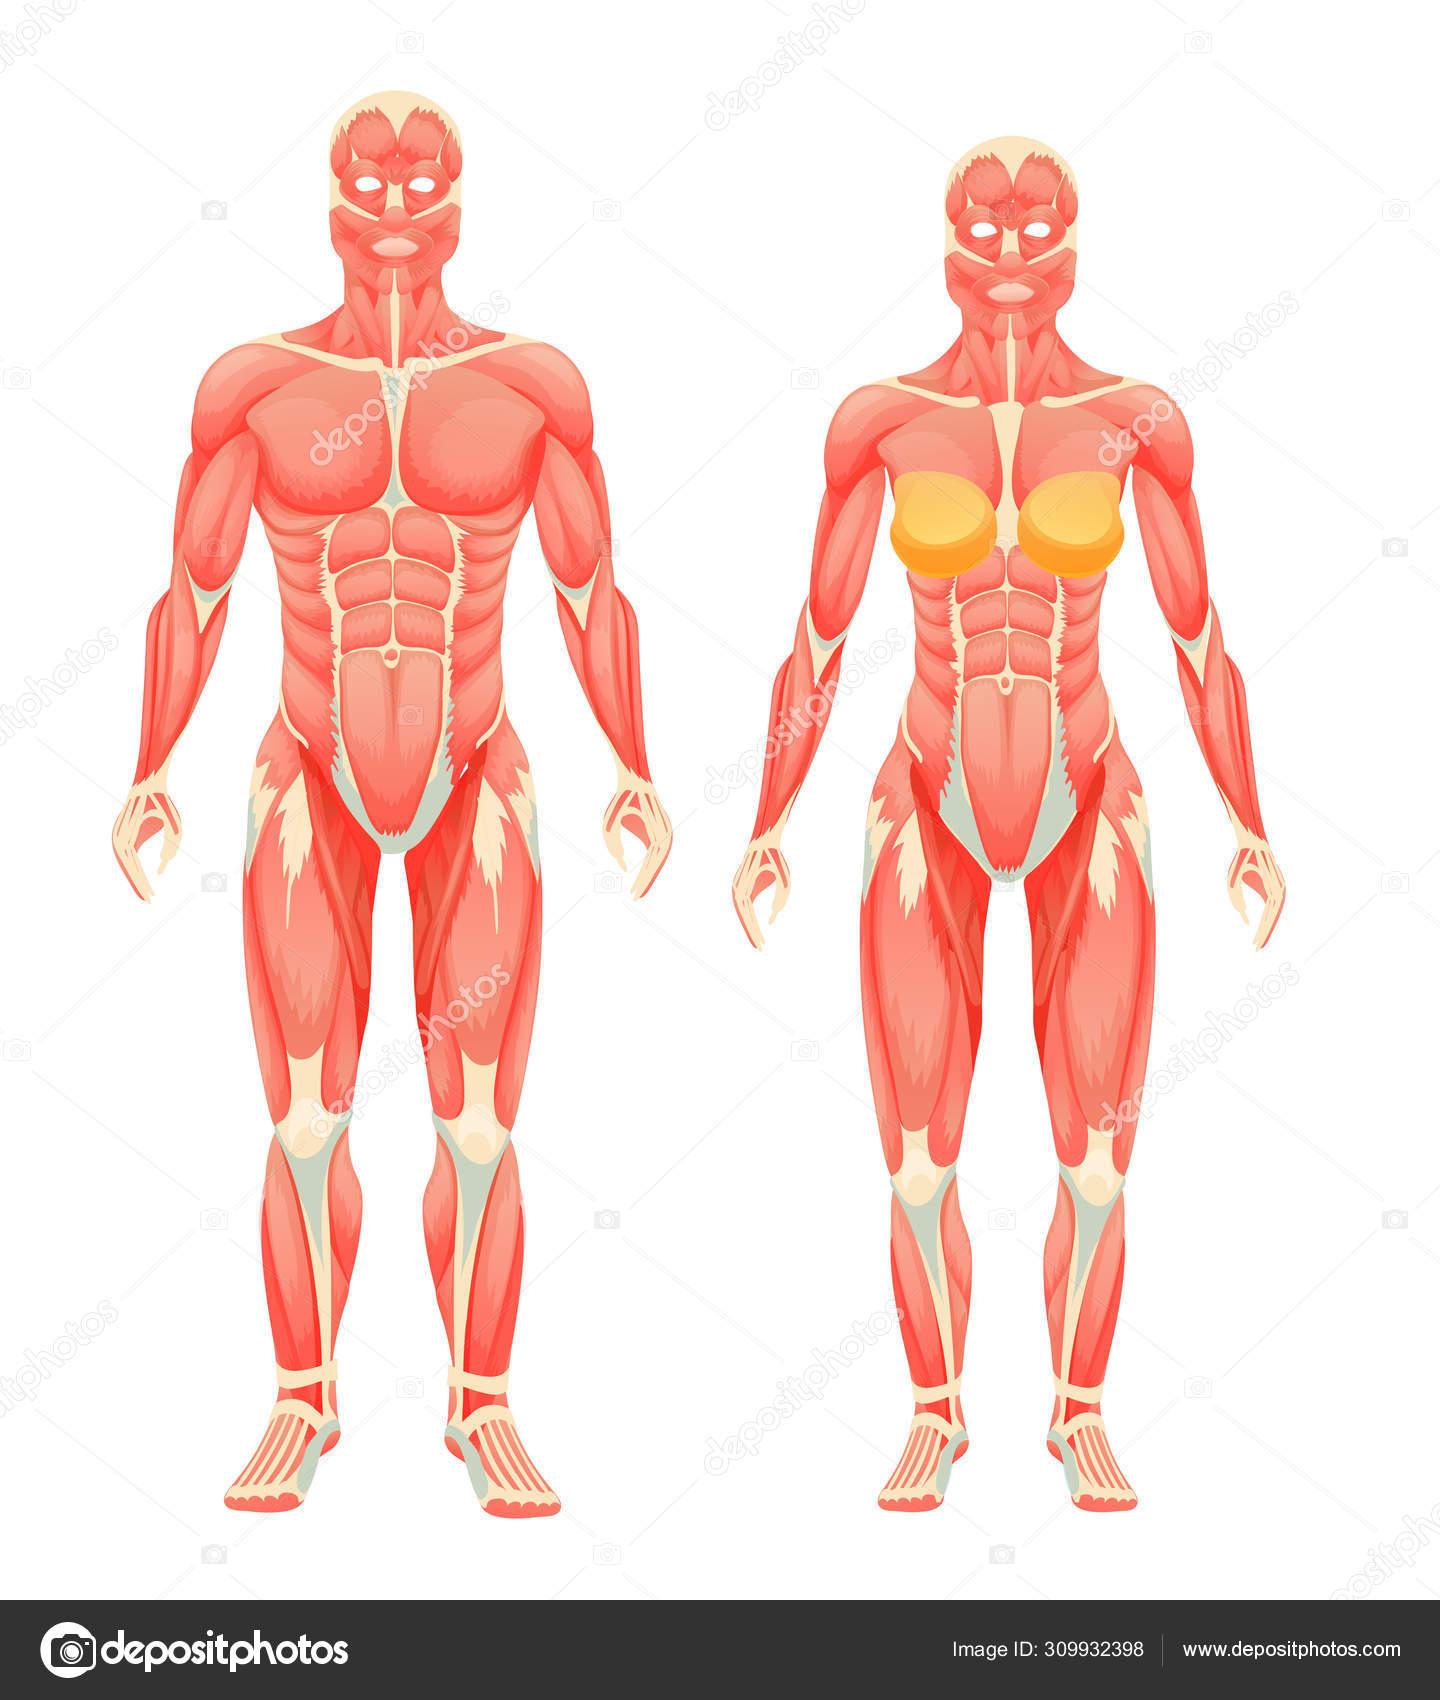 Estrutura Anatômica De Corpos Humanos Femininos E Masculinos